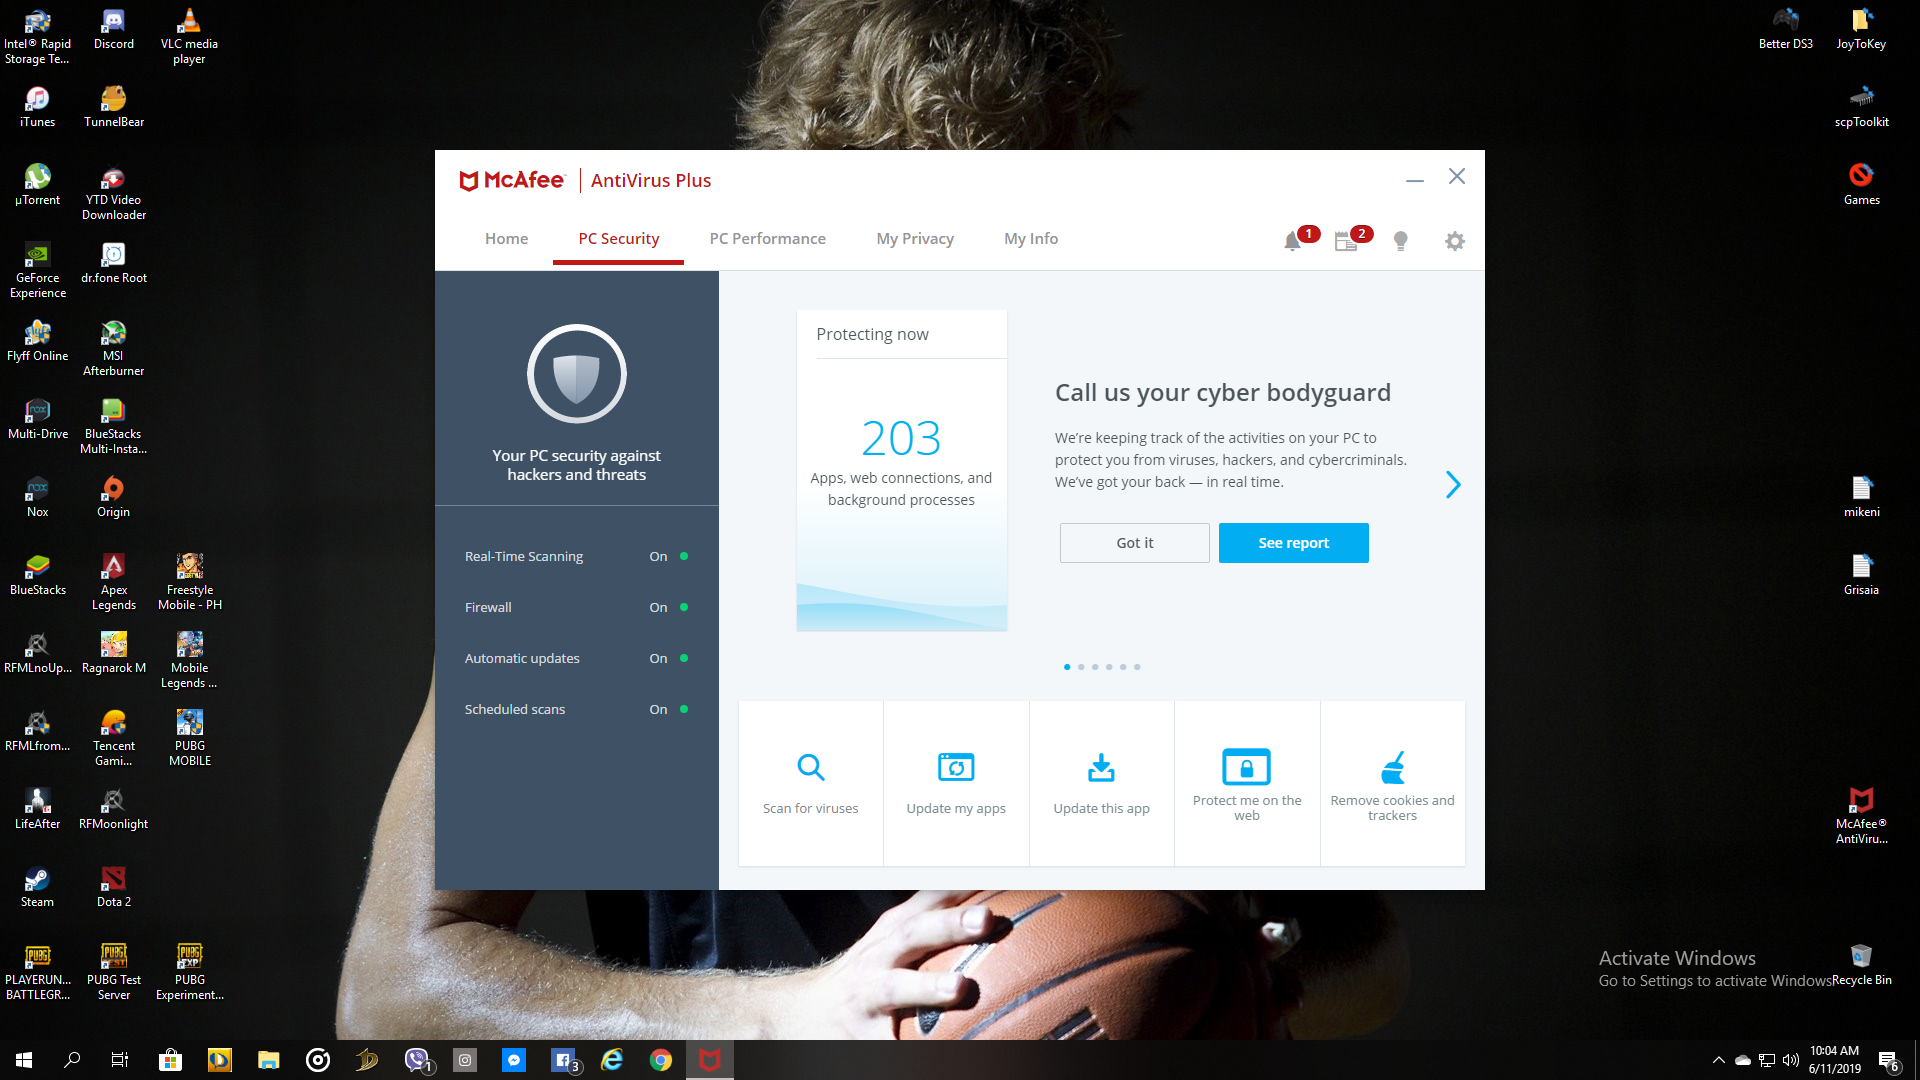 For Windows 10 McAfee Antivirus Plus 2019 10+ Years subscription till  8/16/2029